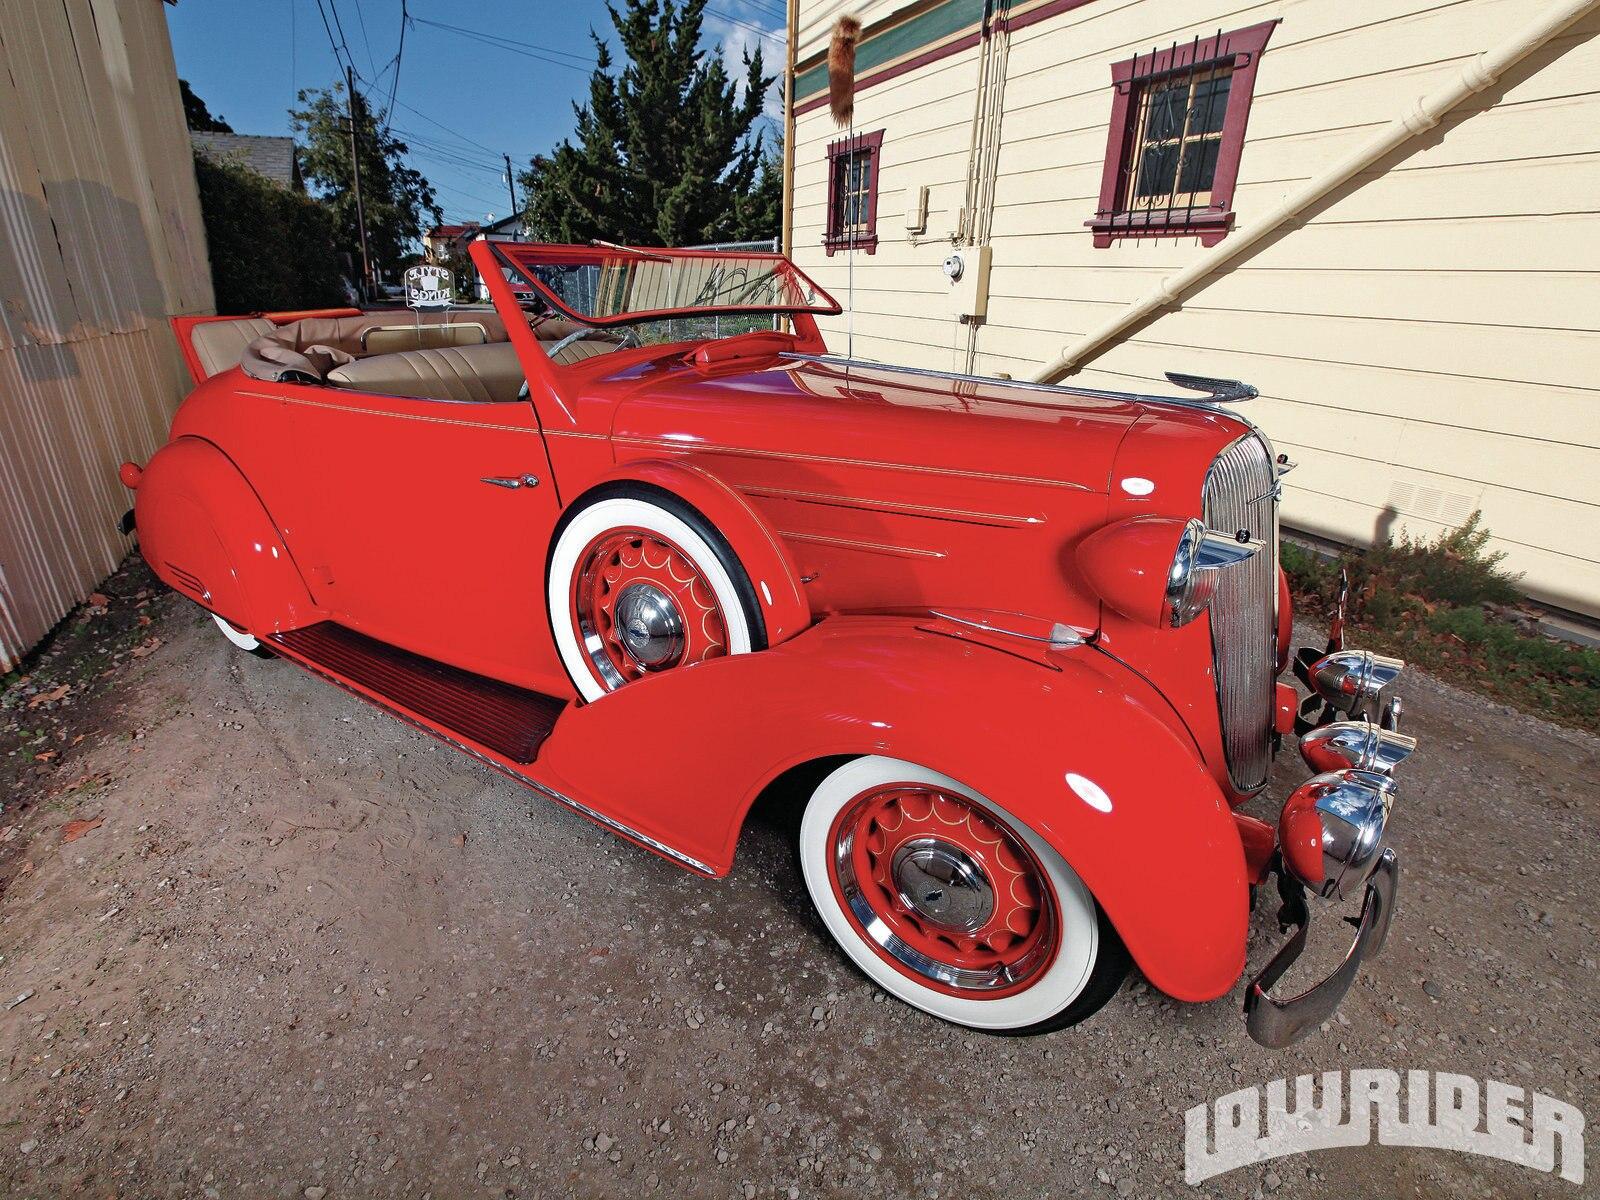 1207-lrmp-01-o-1936-chevrolet-sport-roadster-passenger-side-view1